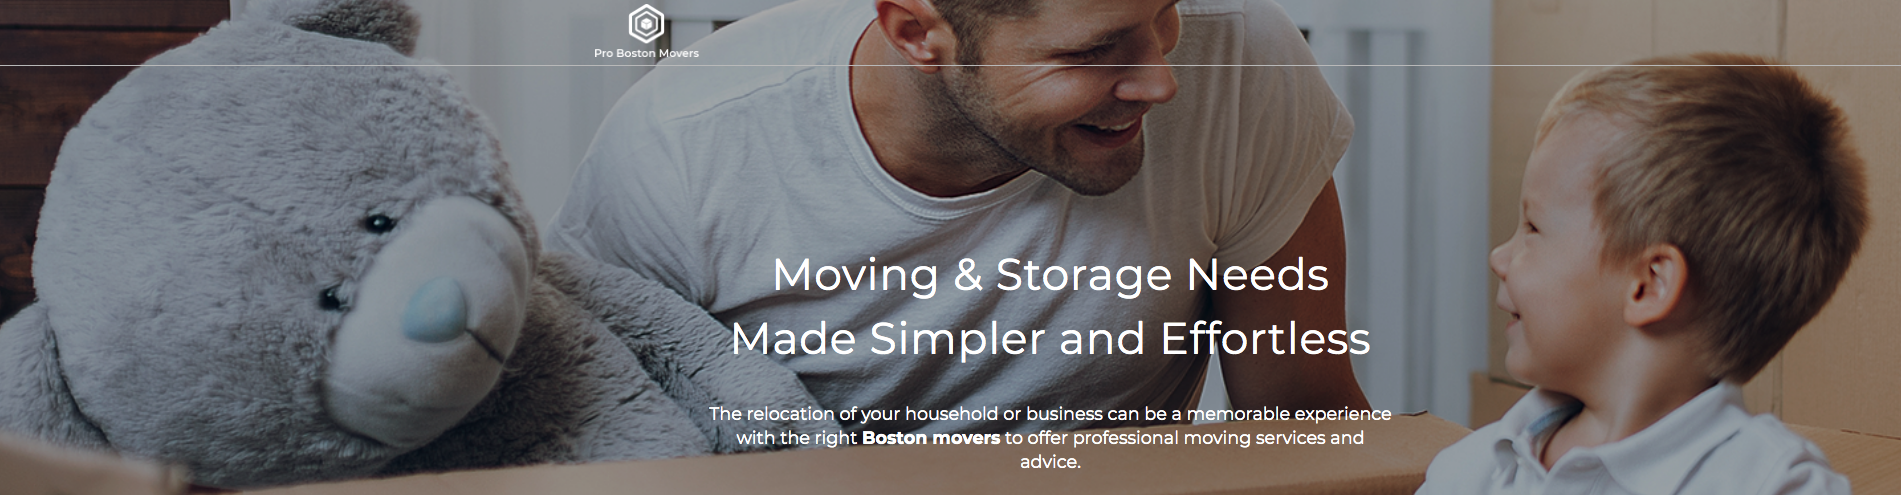 COVER_Pro Boston Movers.jpg